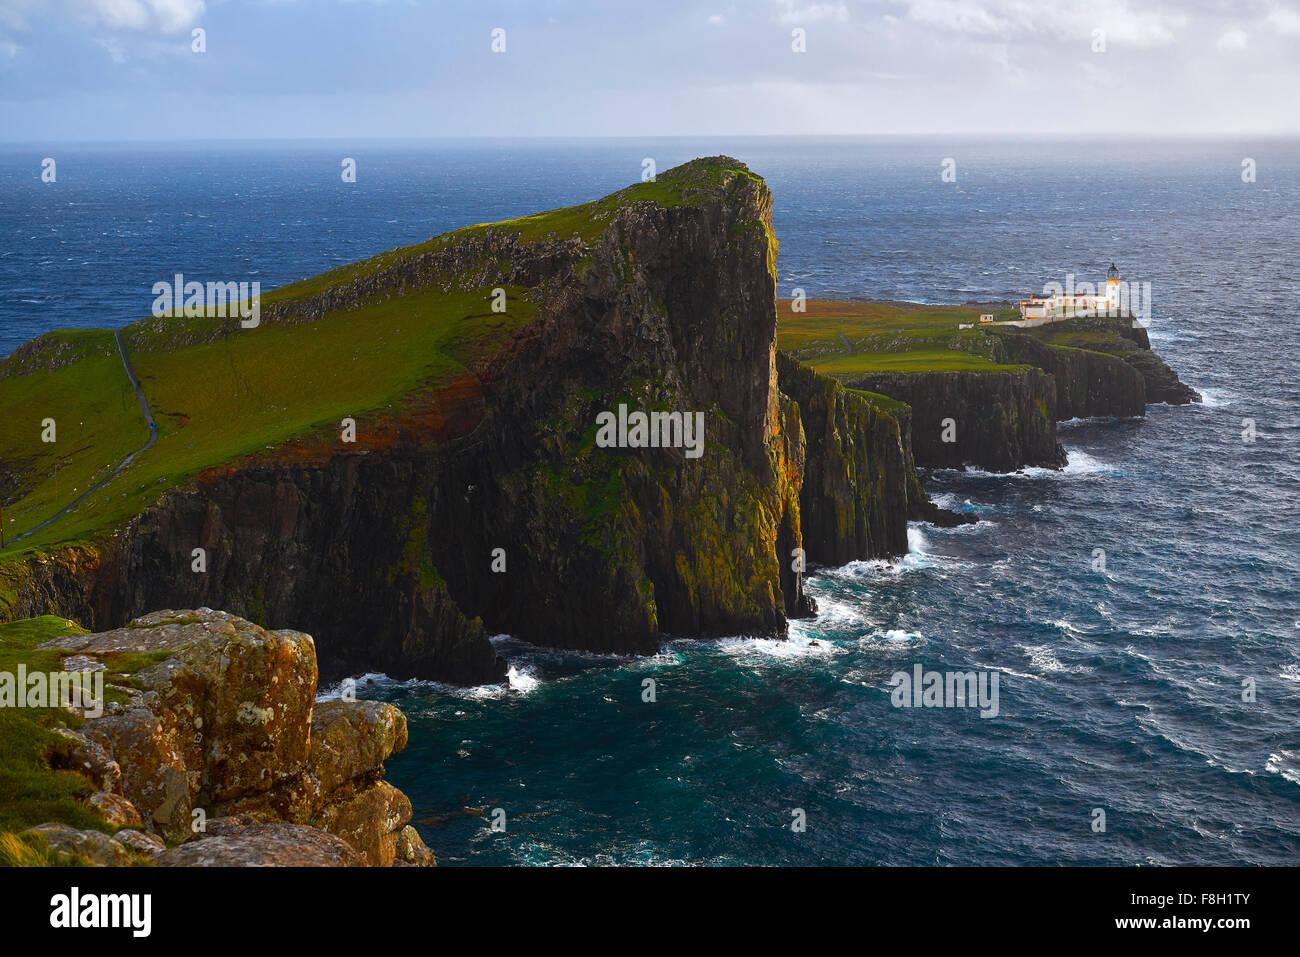 Vista aérea de acantilados de Neist Point, Isla de Skye, Escocia Foto de stock